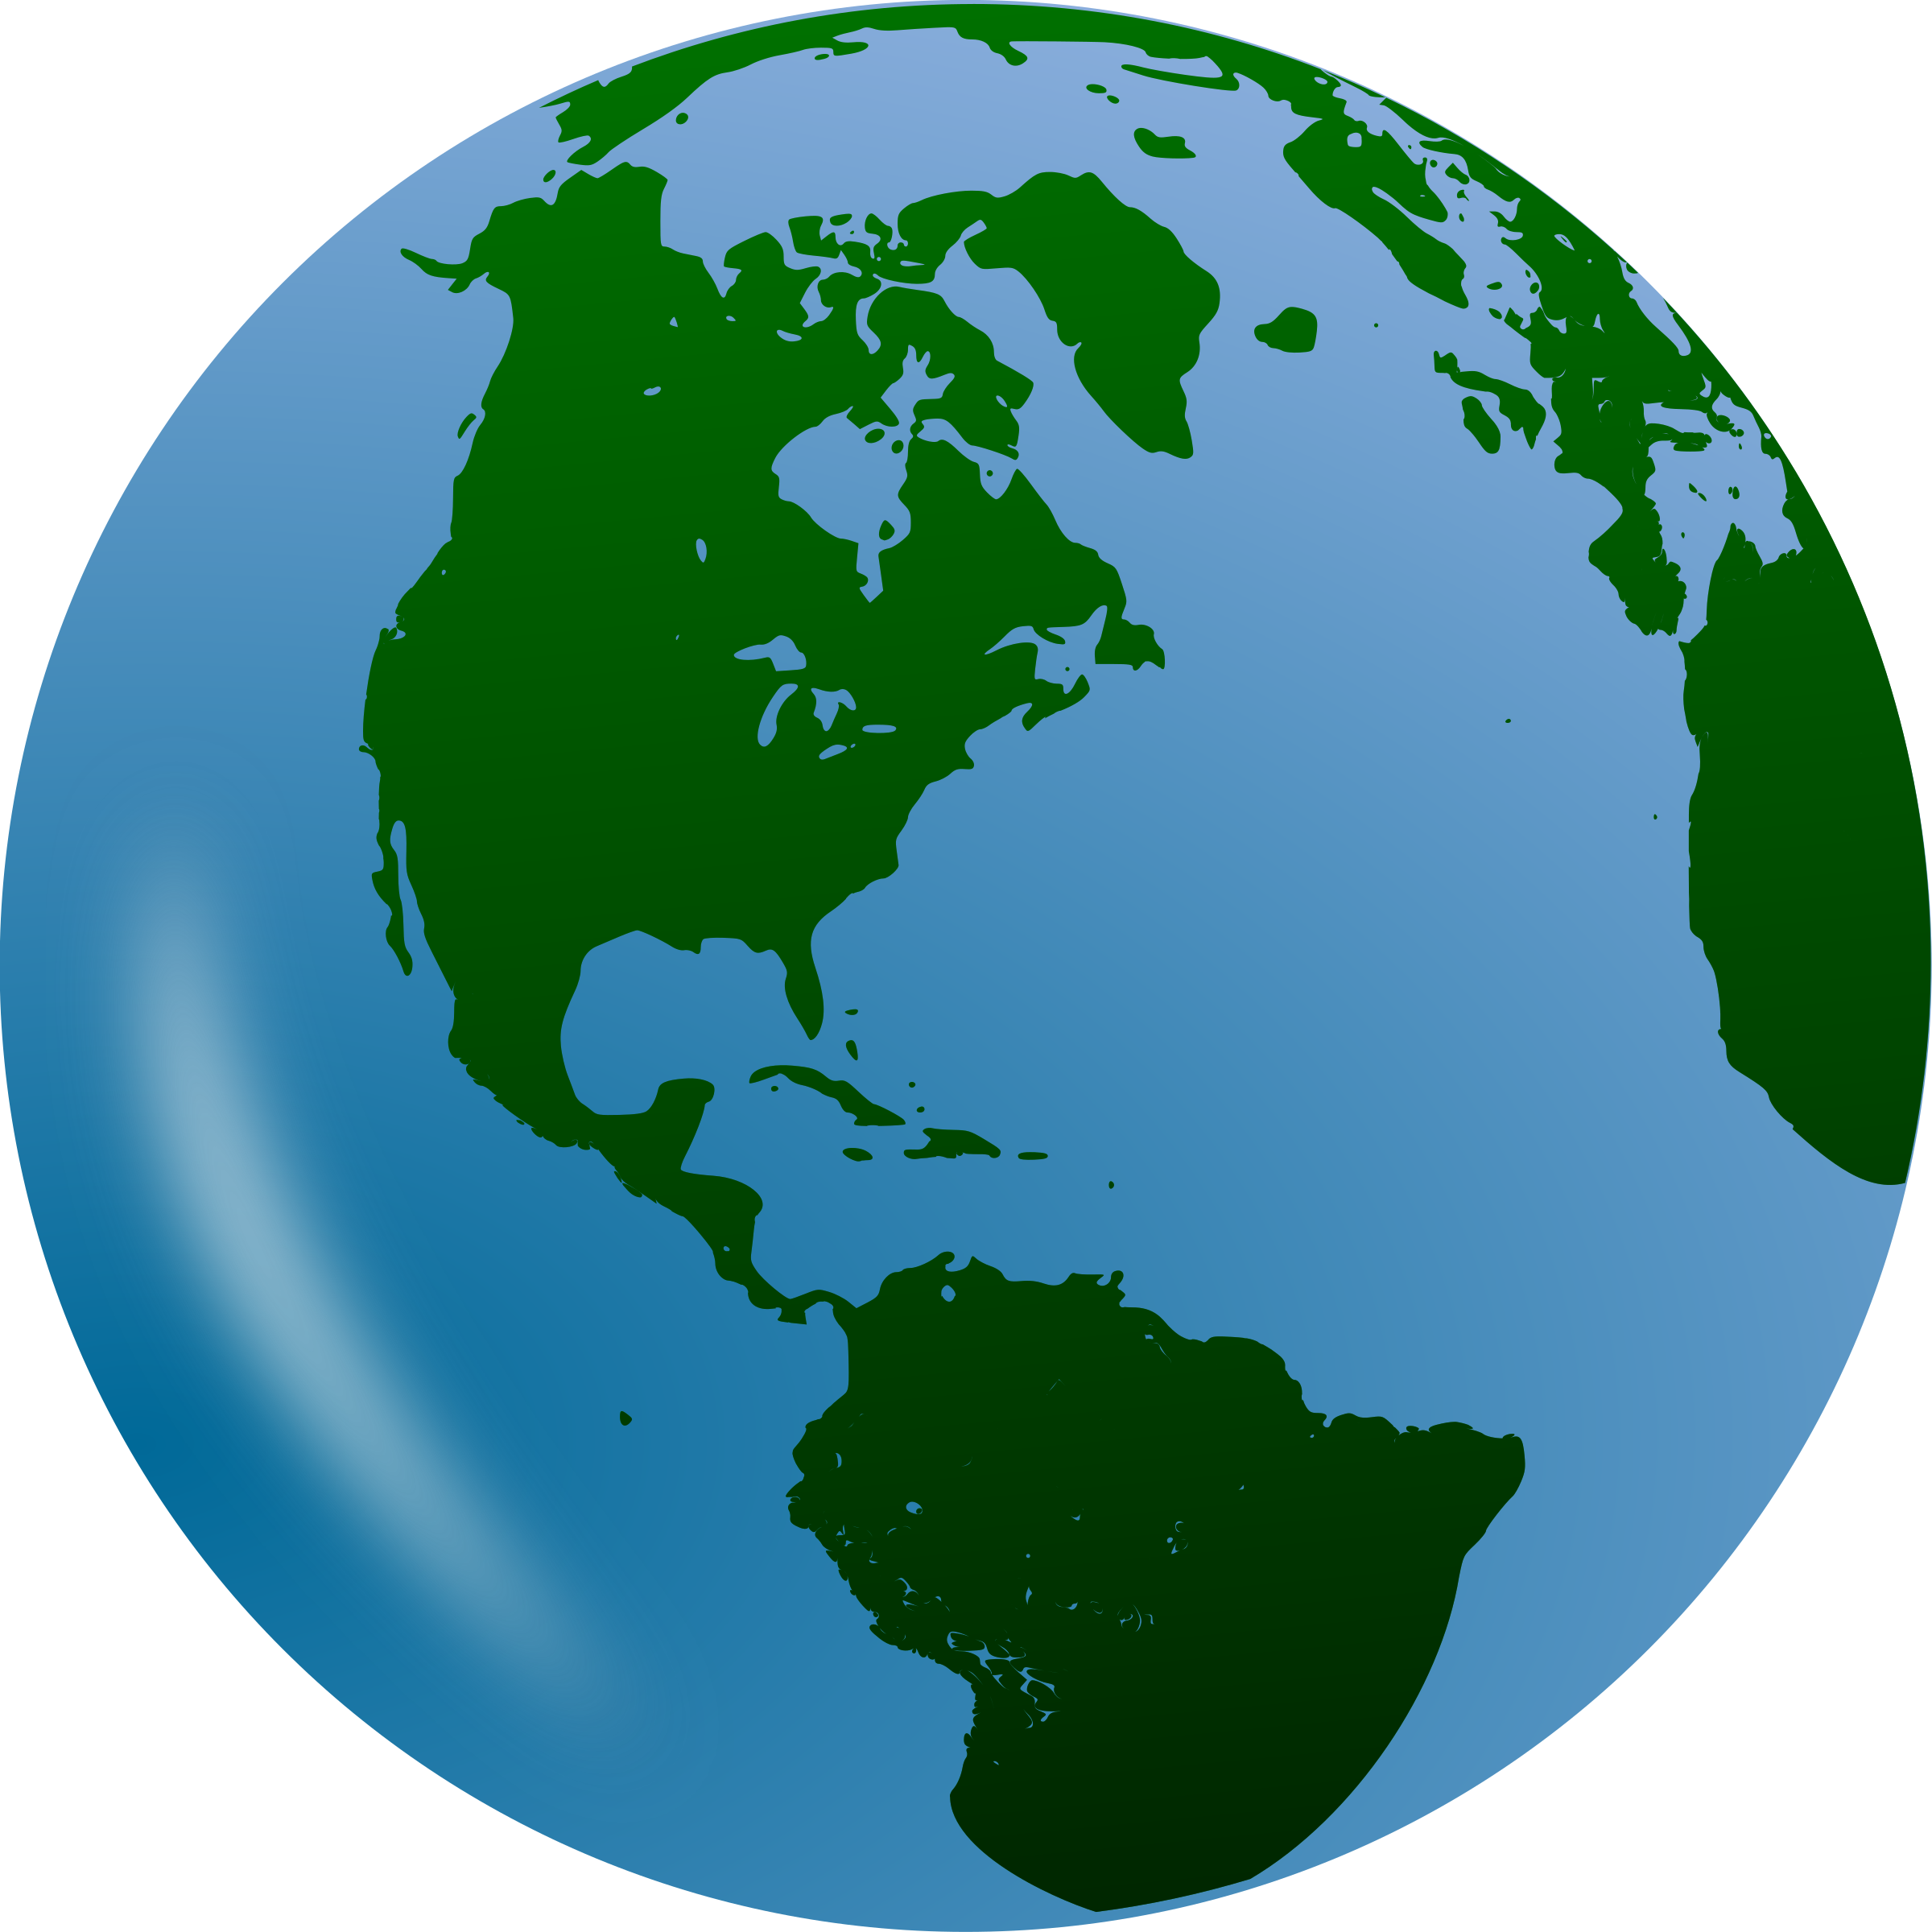 world clipart